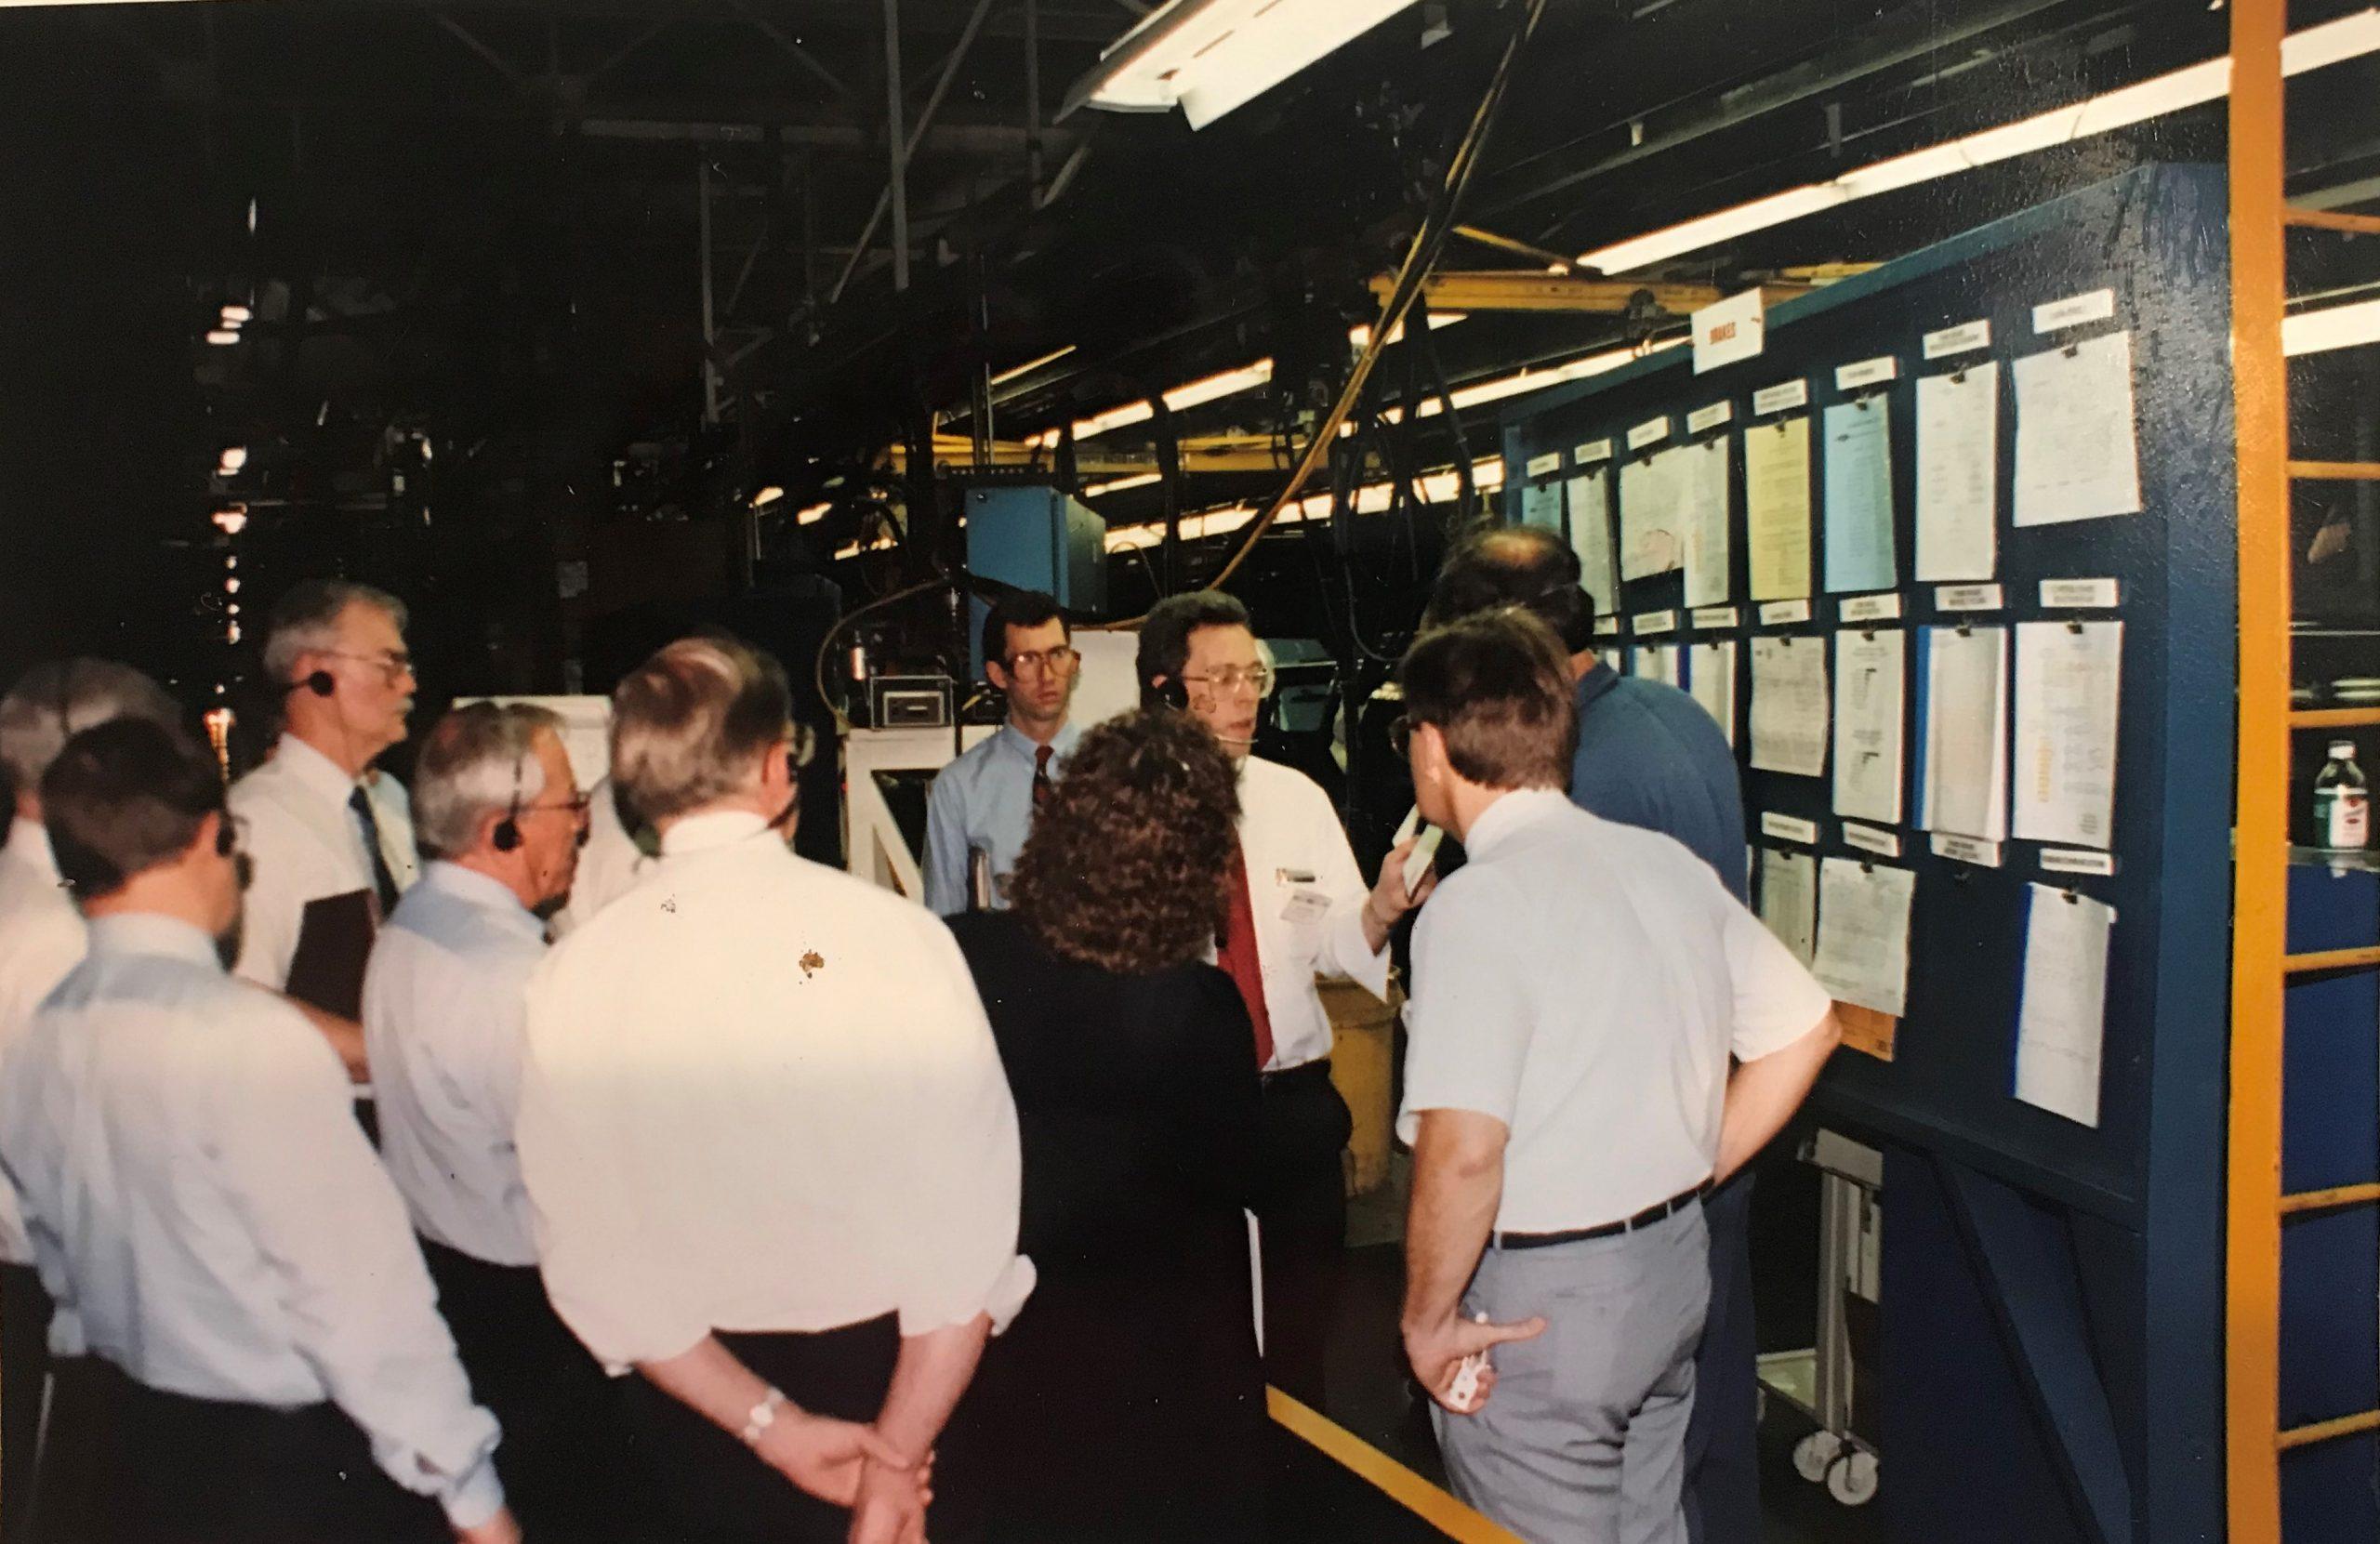 Mementos Steve Beeler LAP Process Capability Reviewe circa 1991